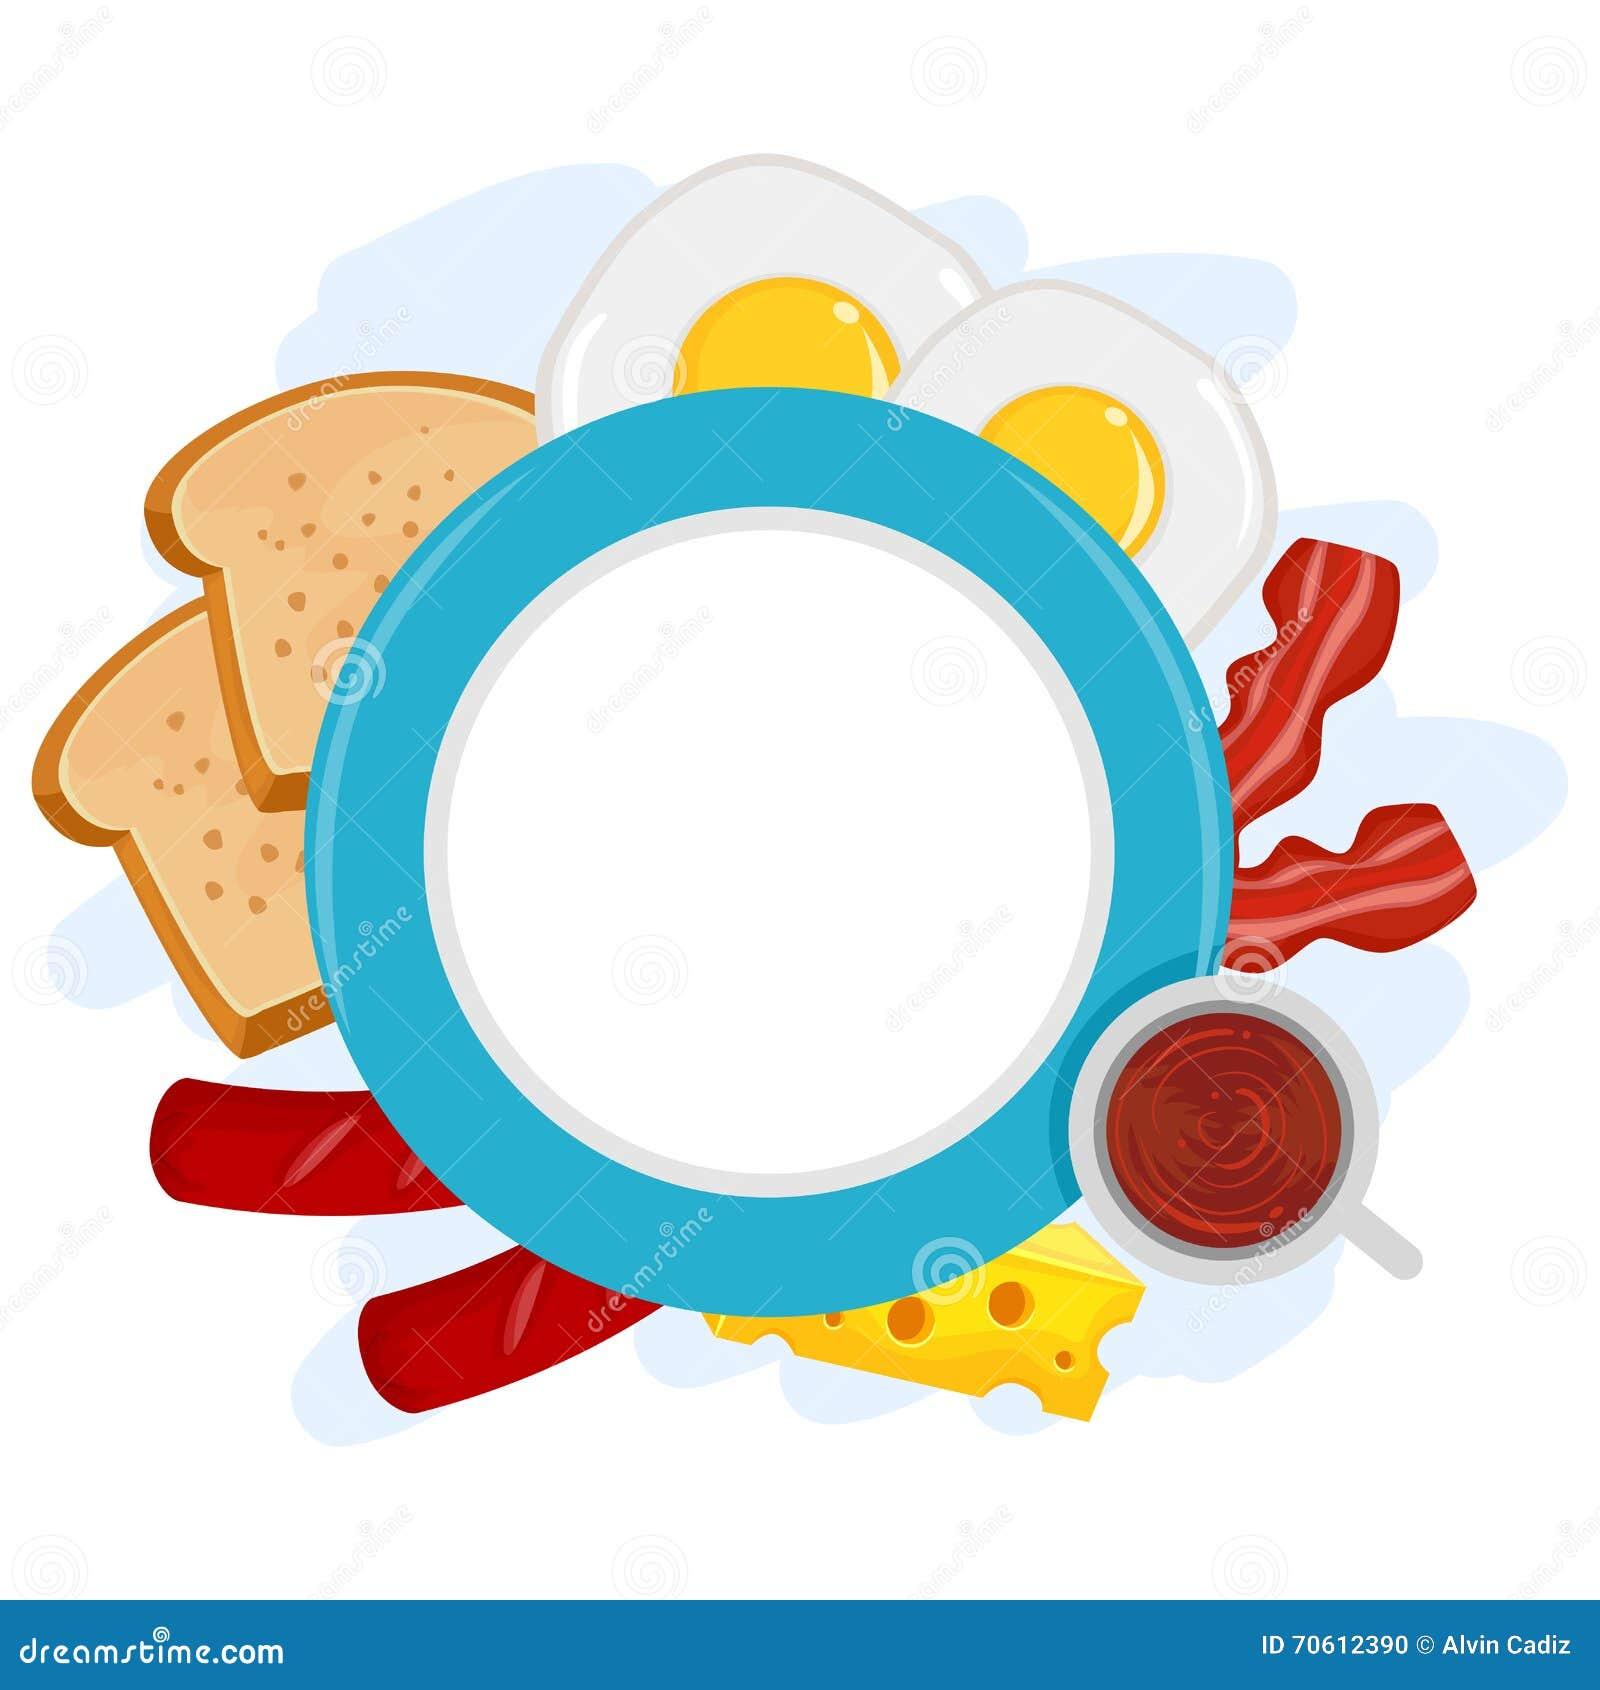 Breakfast Plate Frame Stock Vector Illustration Of Coffee 70612390